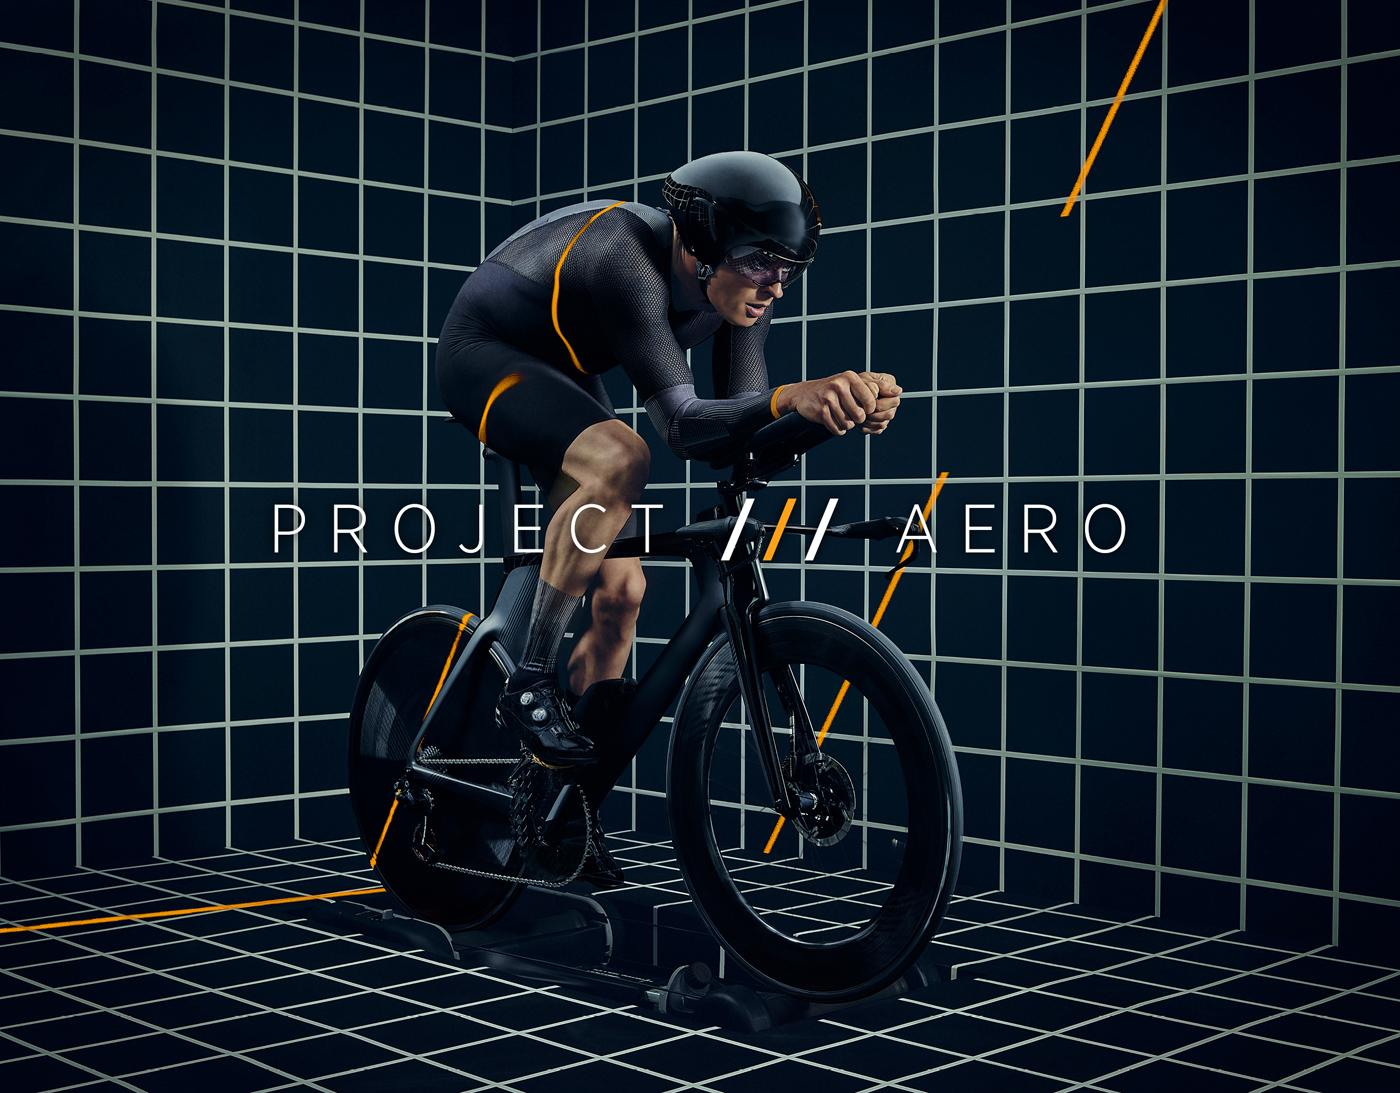 LeCol_x_McLaren_Project_Aero_header2